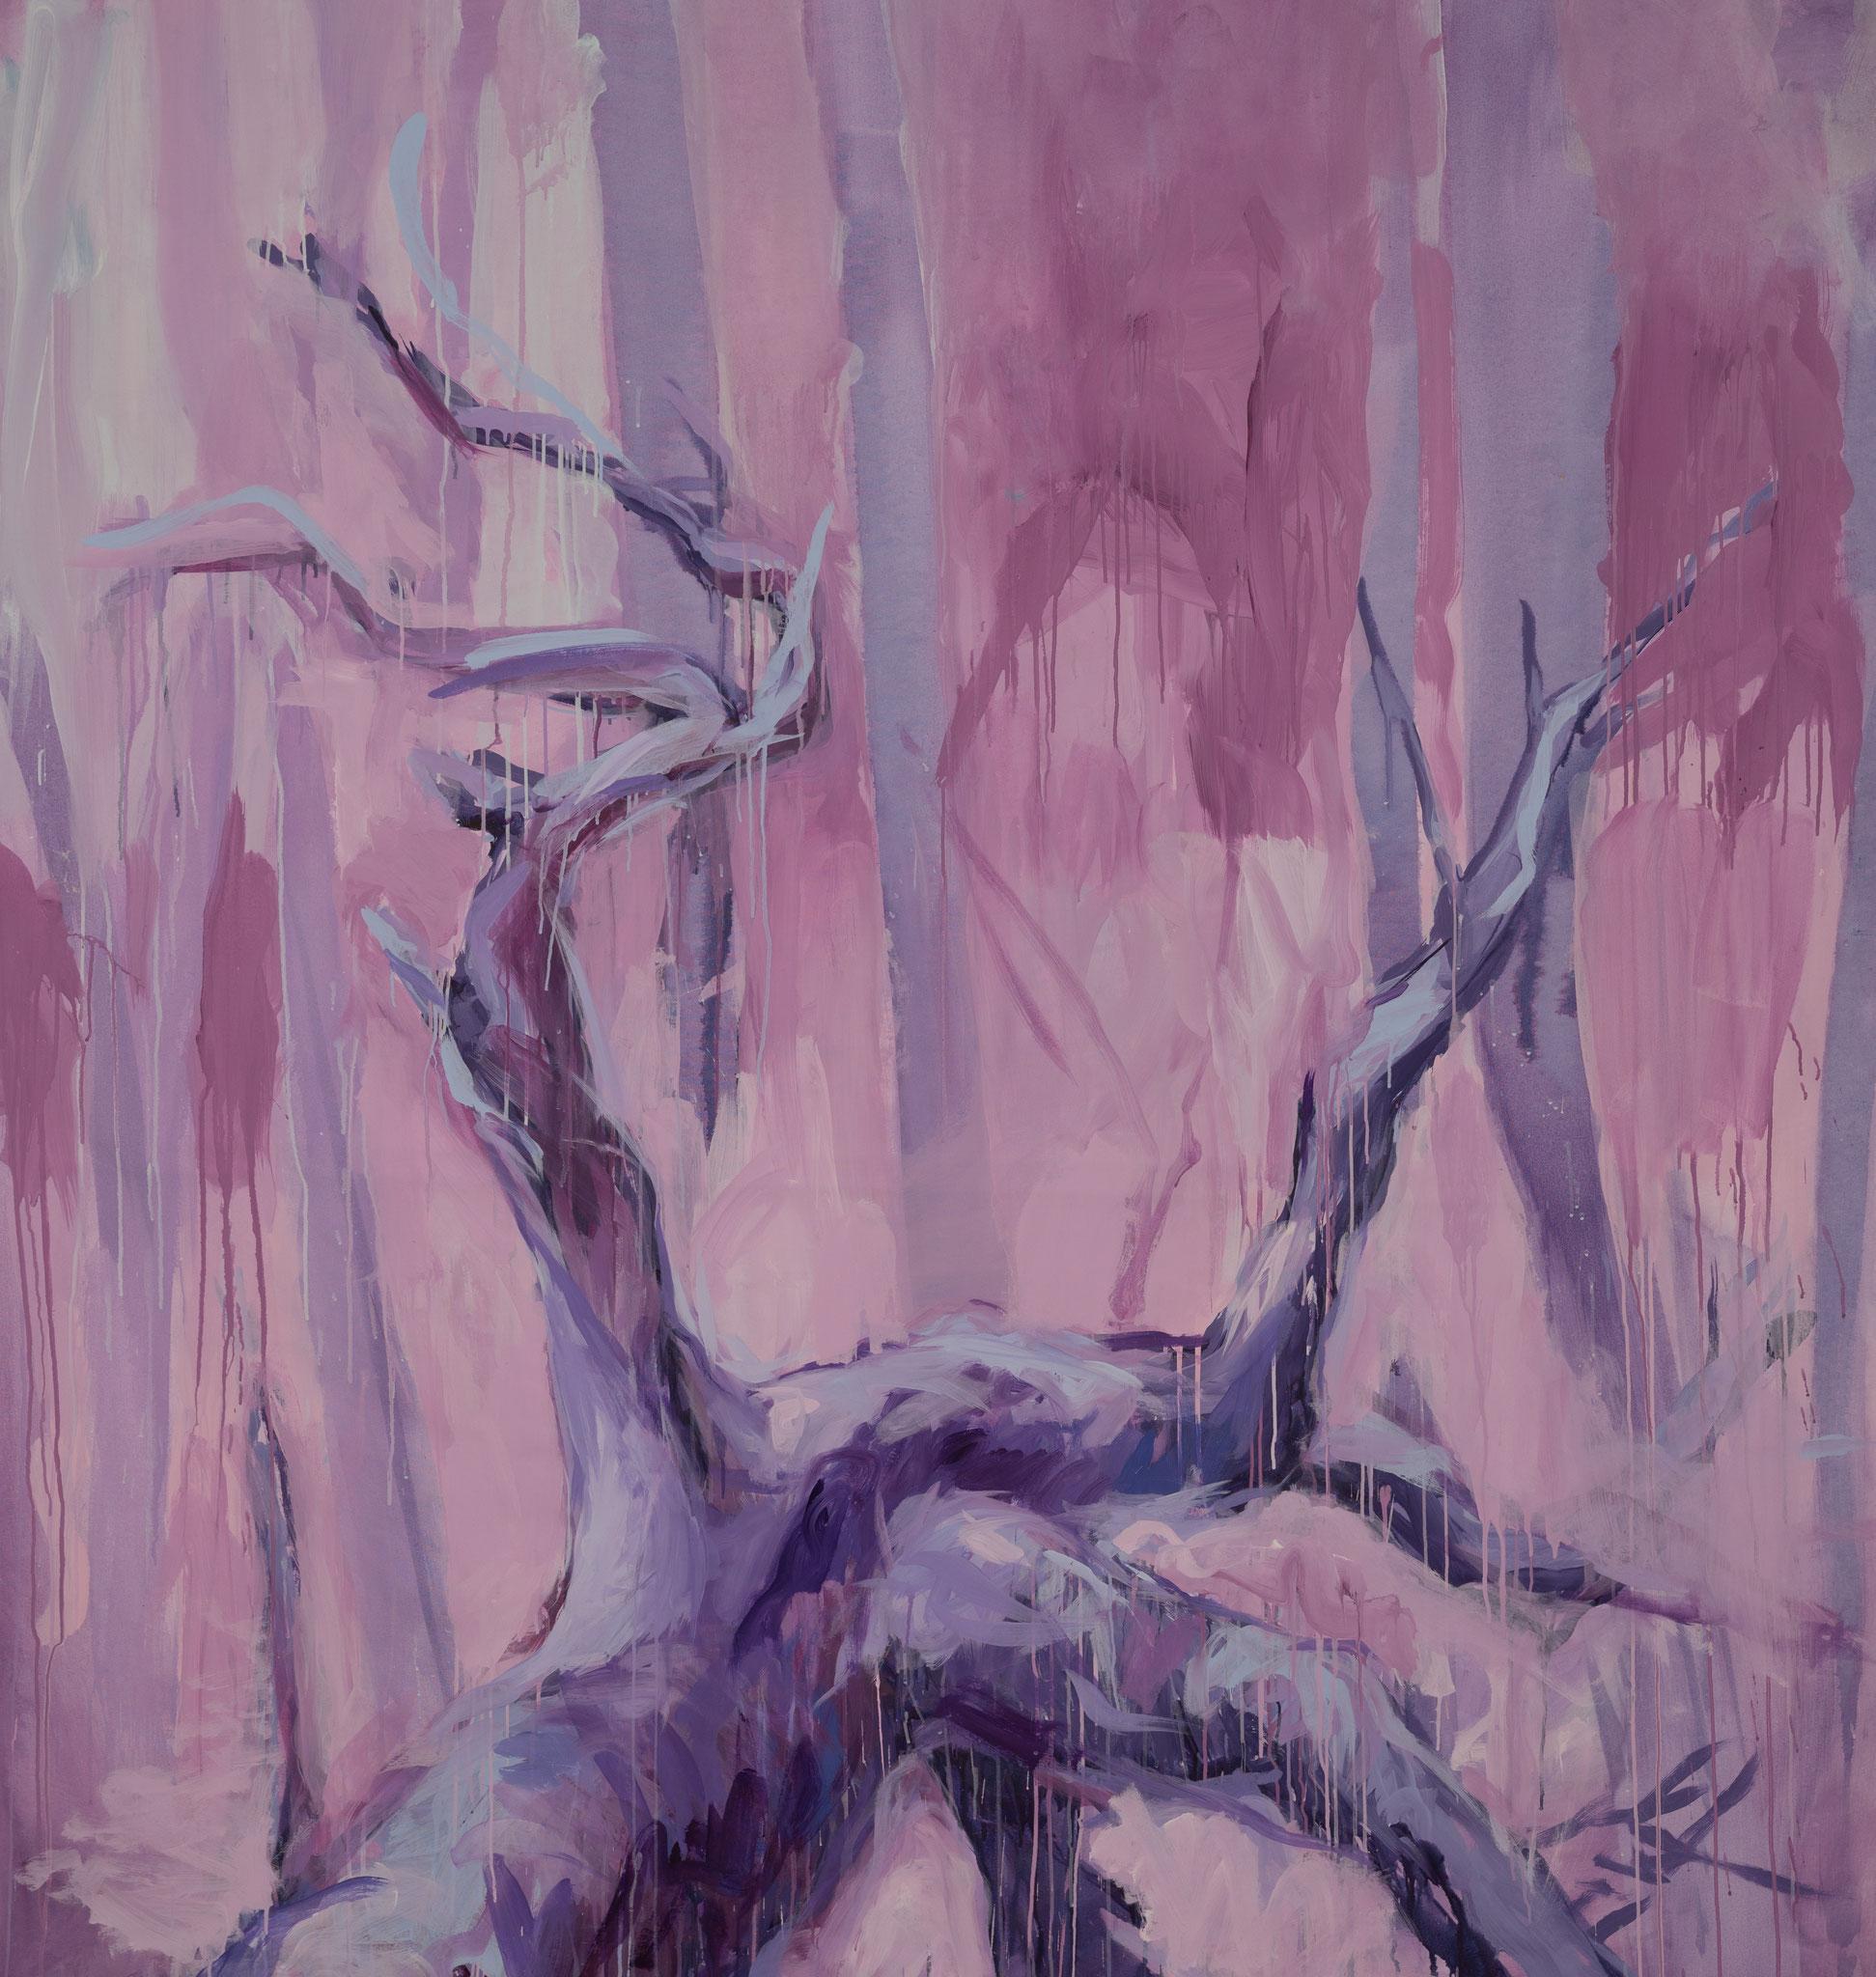 """Lila Forest Dream"" 215 x 200 cm - Acryl auf Leinwand"